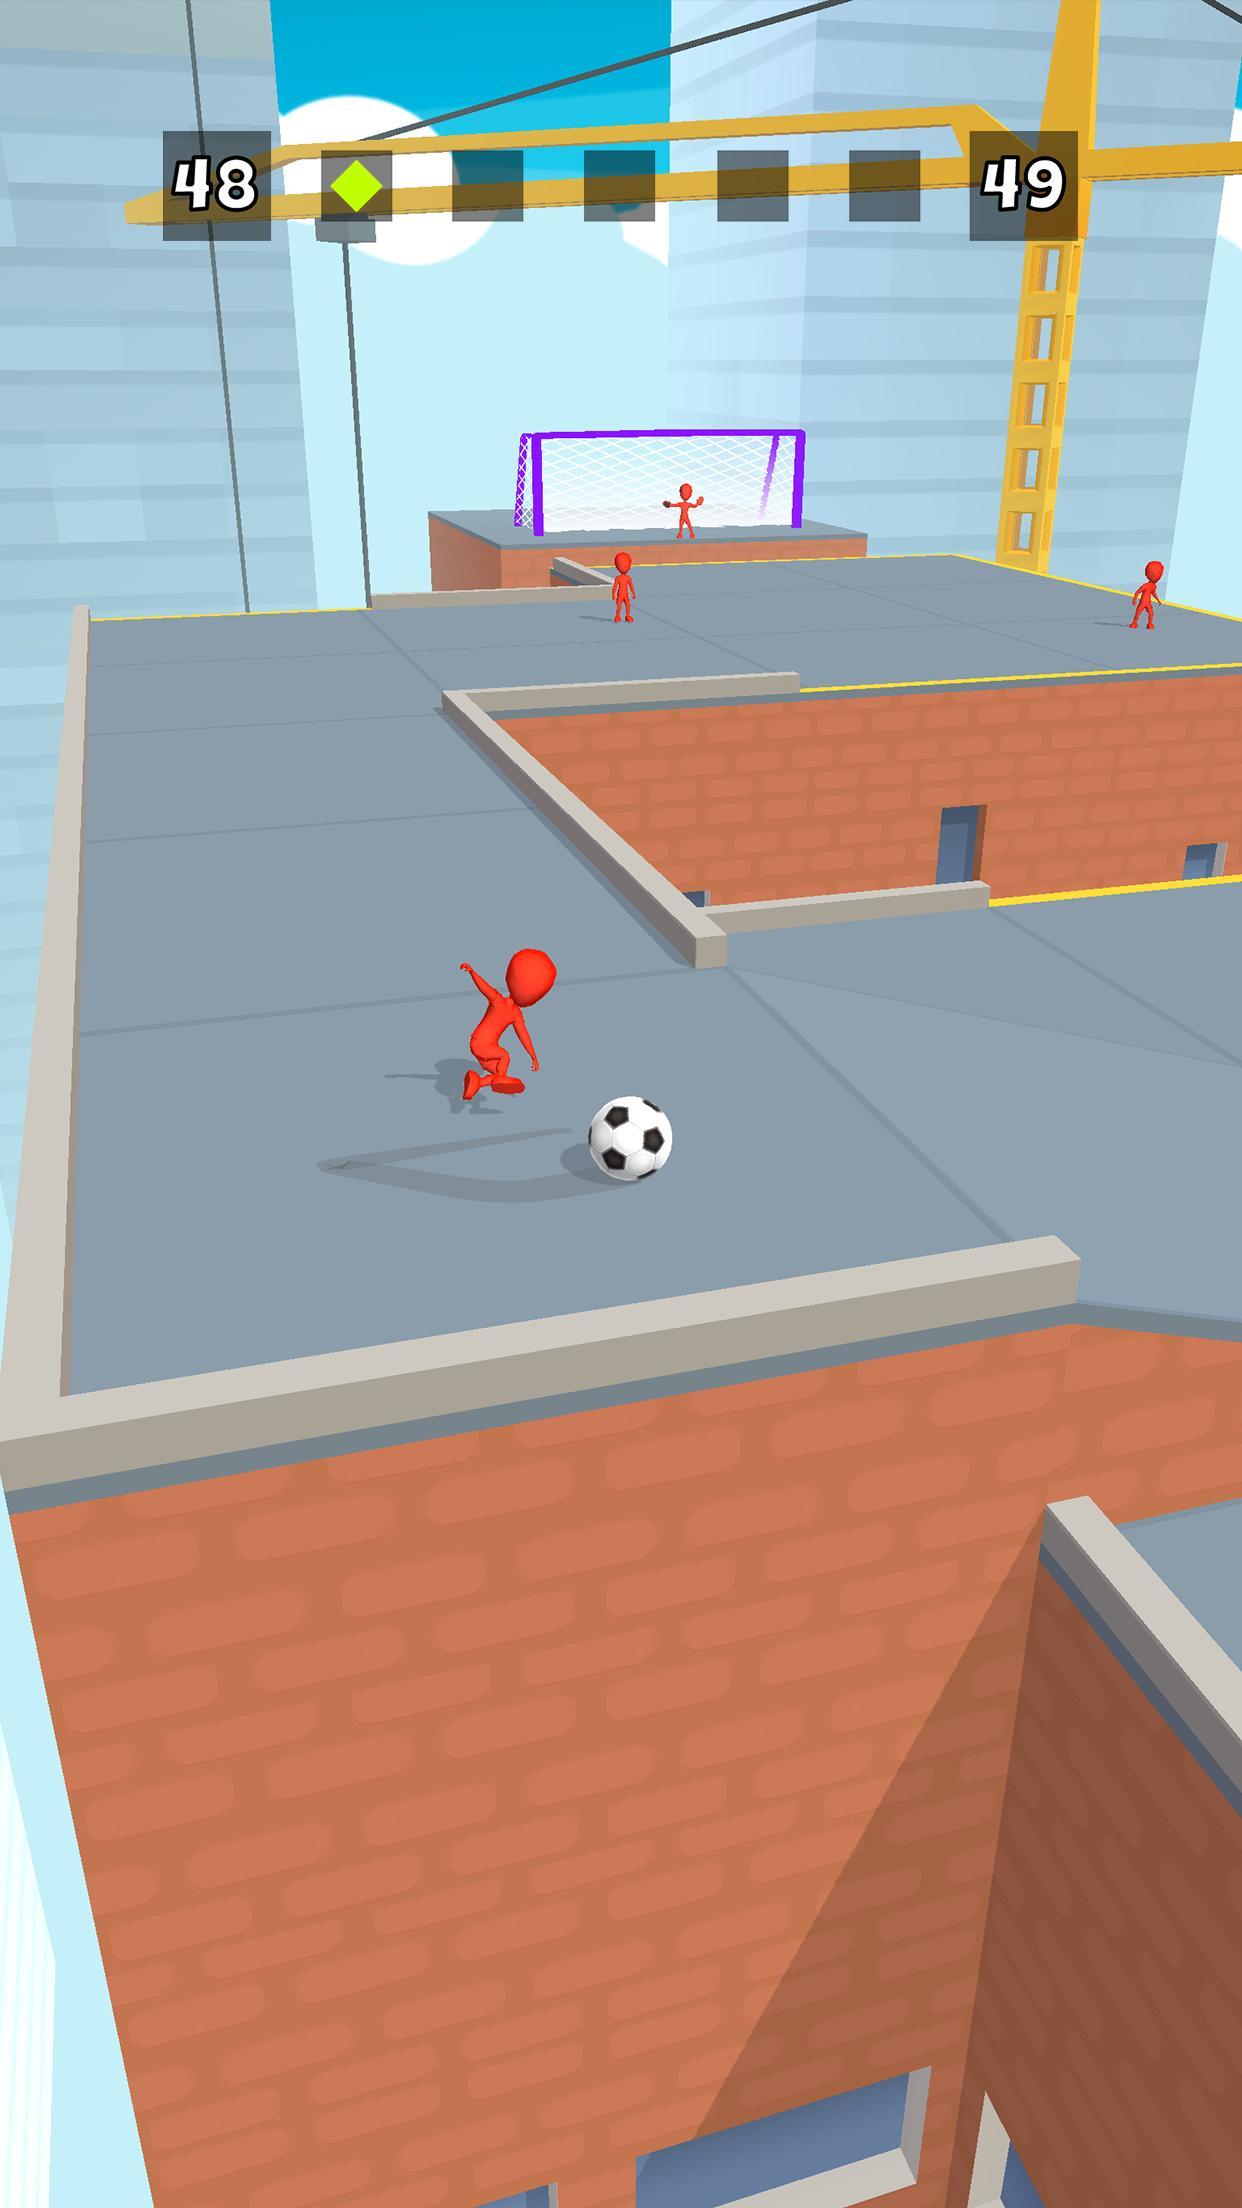 Crazy Kick! 1.7.13 Screenshot 4